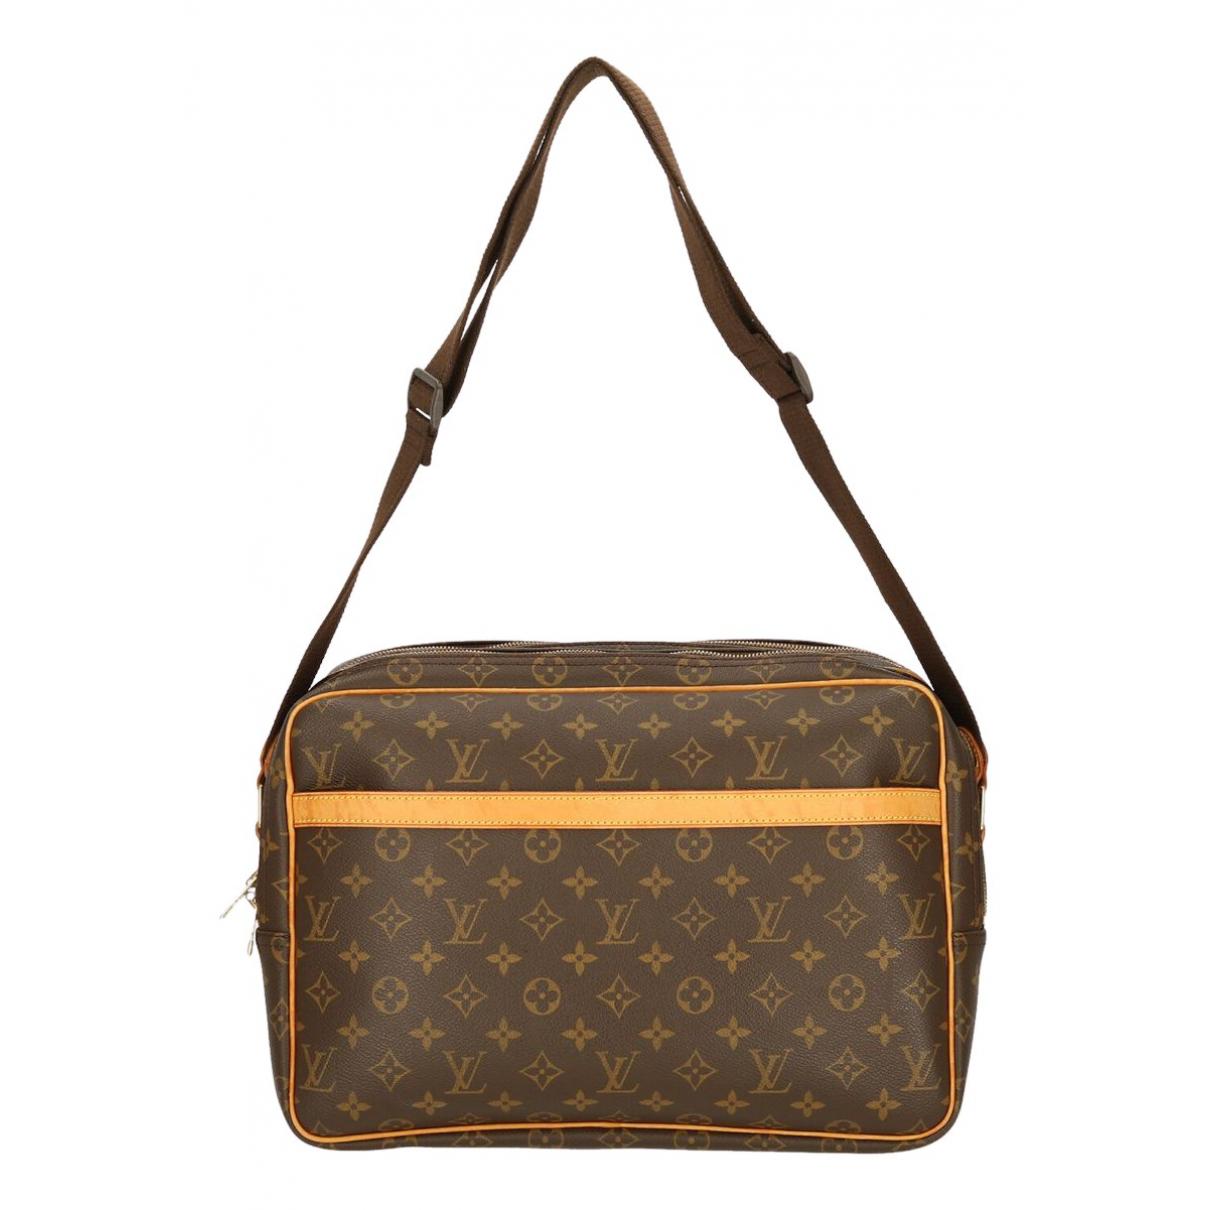 Louis Vuitton - Sac a main Reporter pour femme en toile - marron